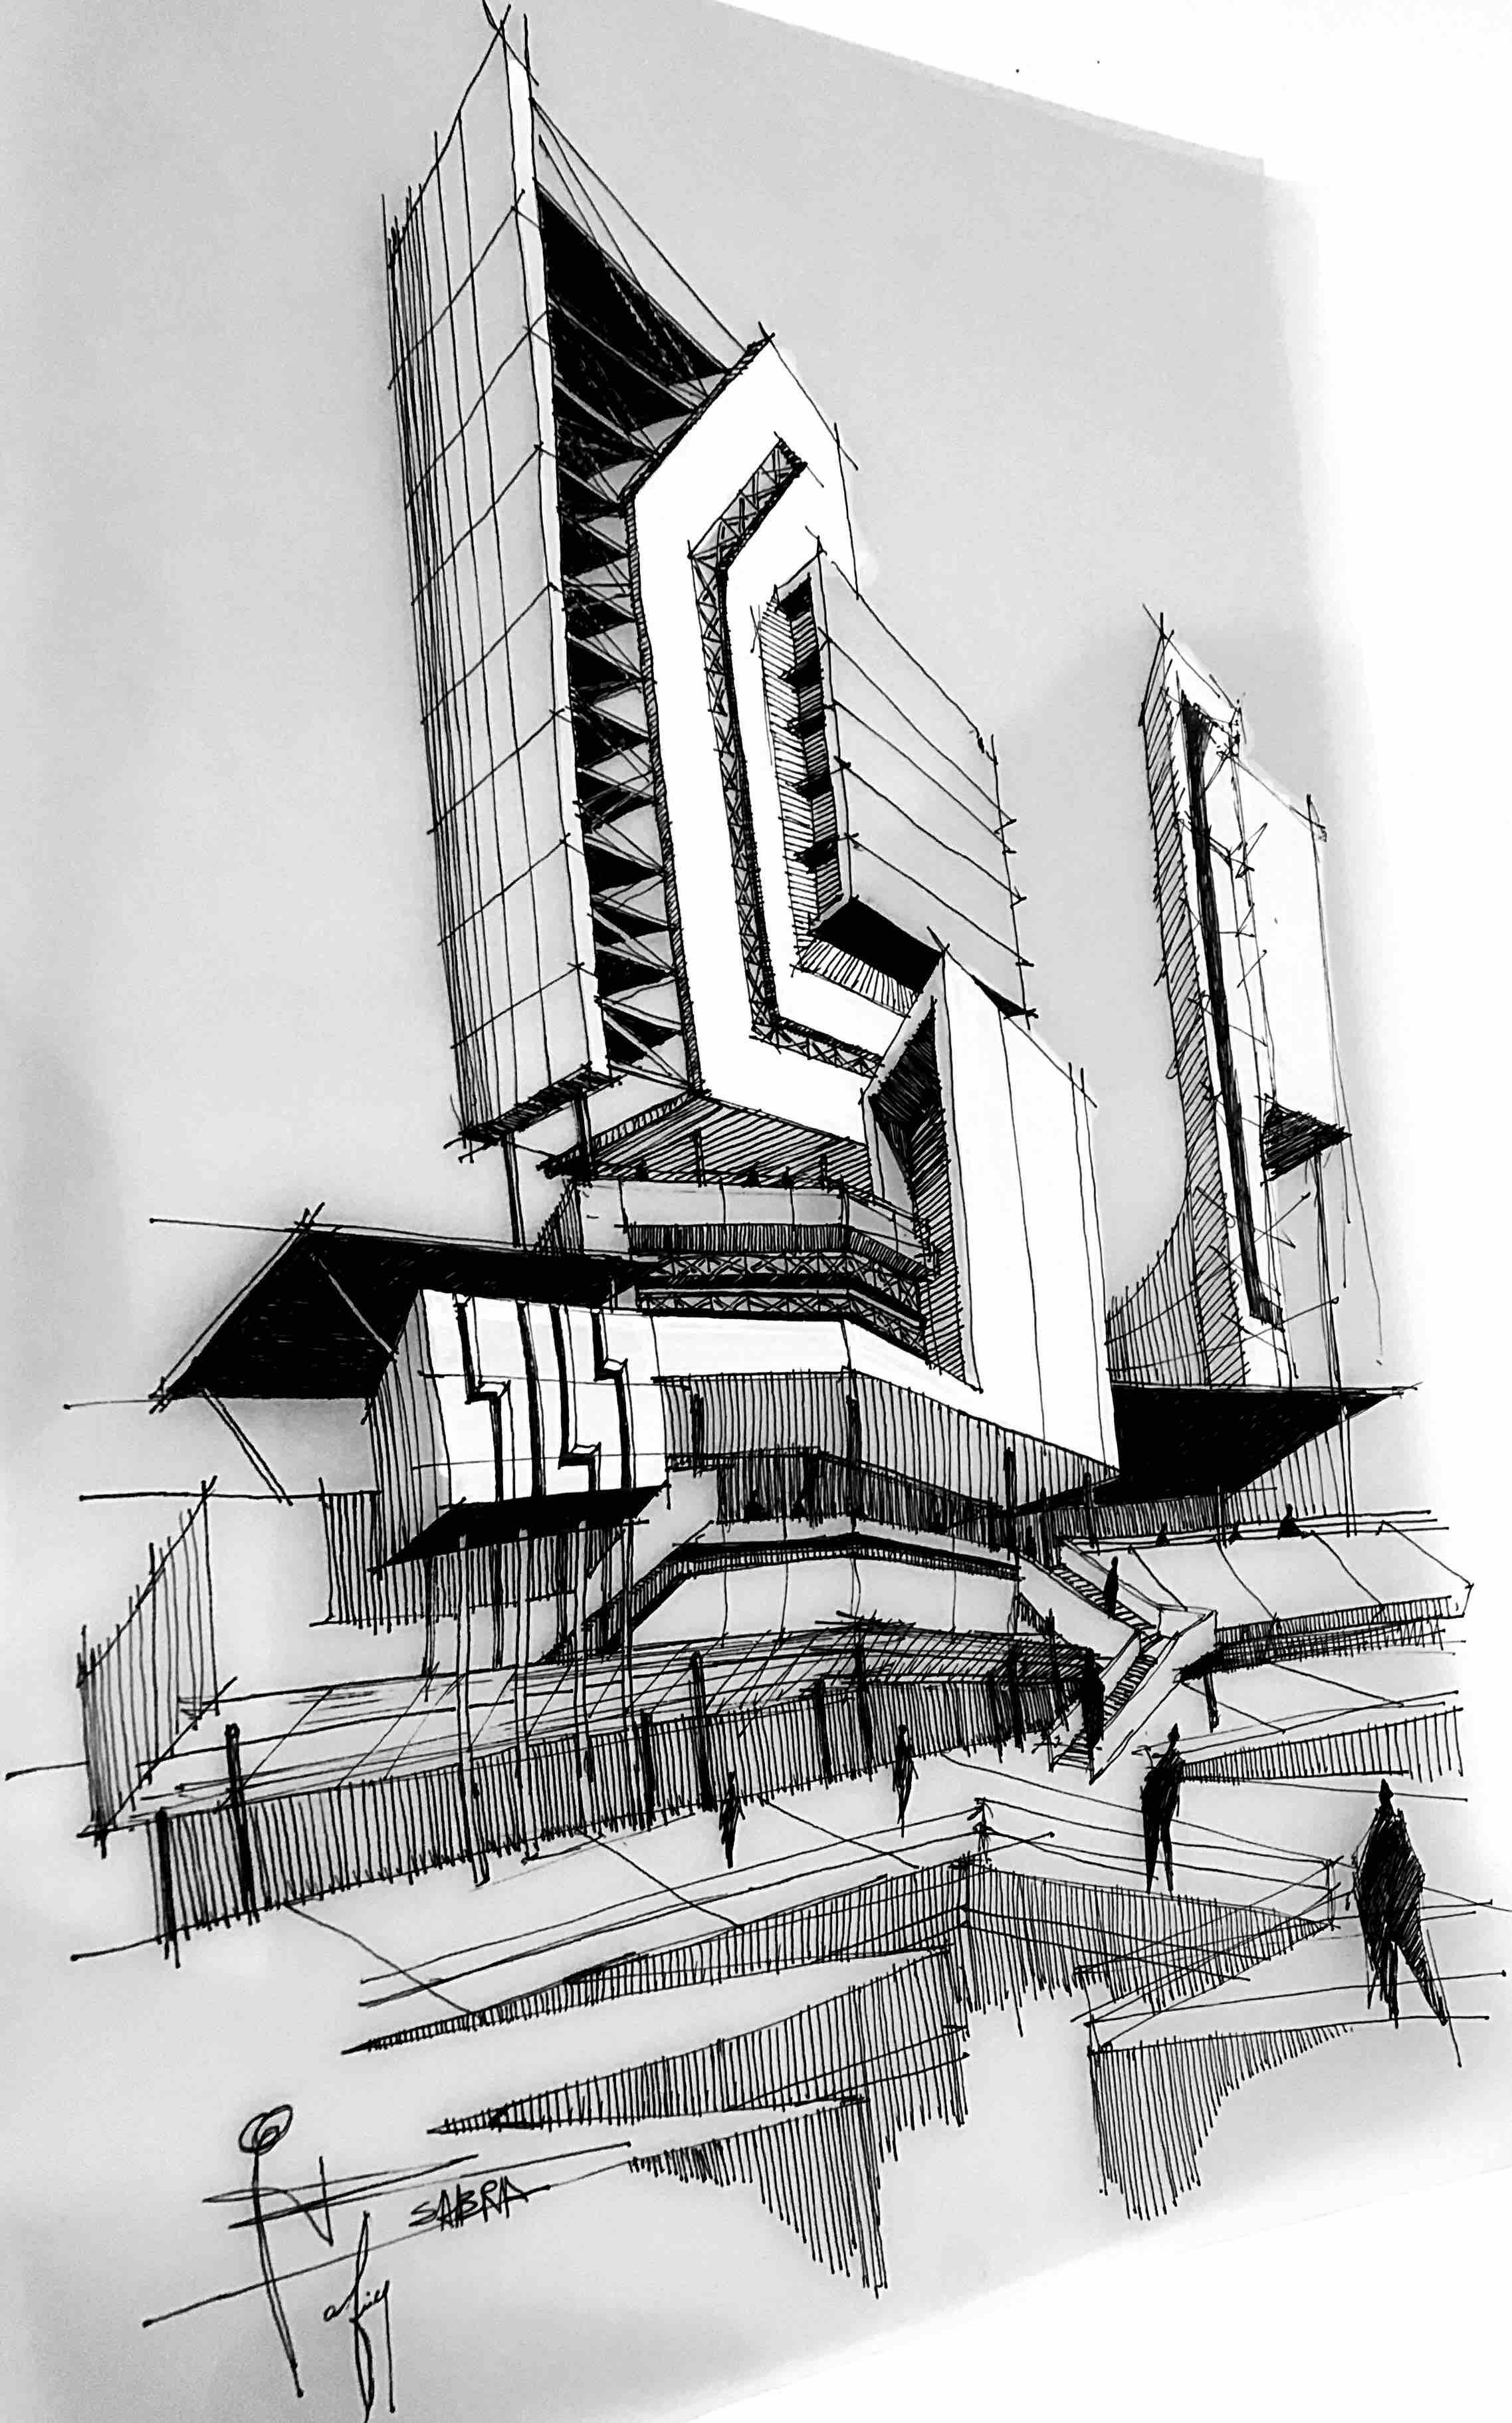 Architectural sketch rafiq sabra 007 jpg